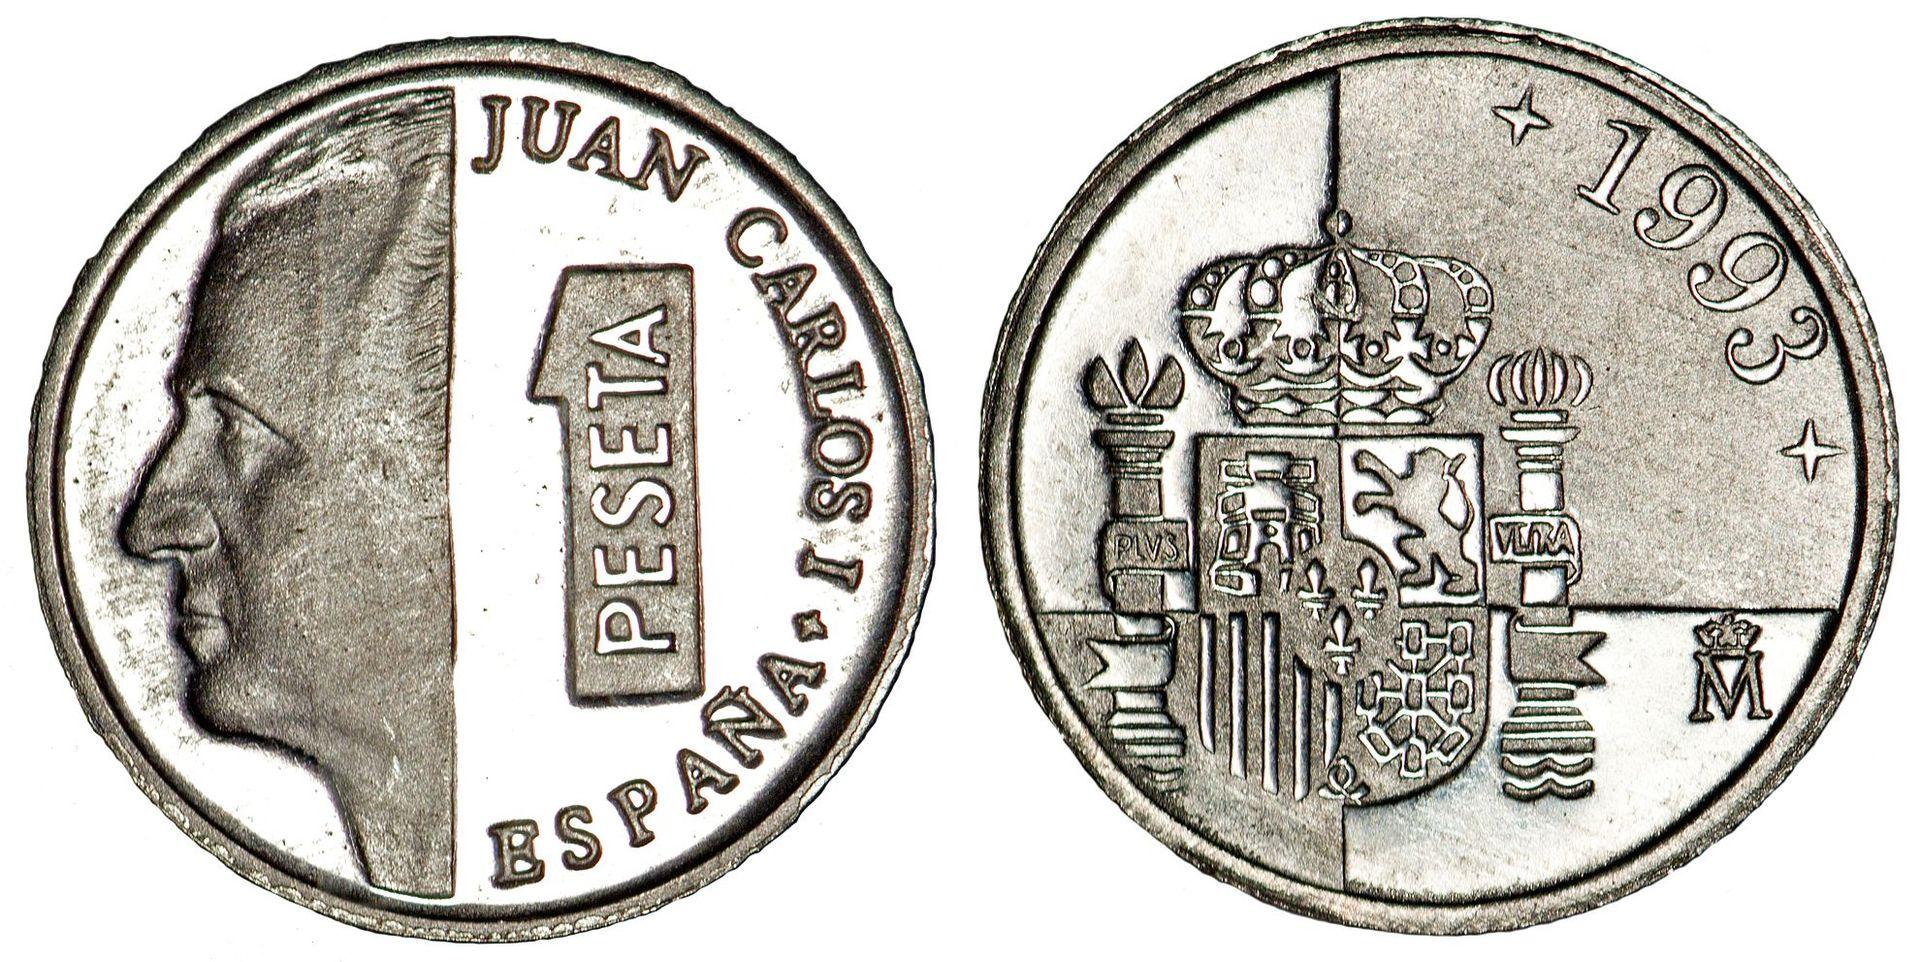 Moneda de 1 peseta, emisión de 1993.